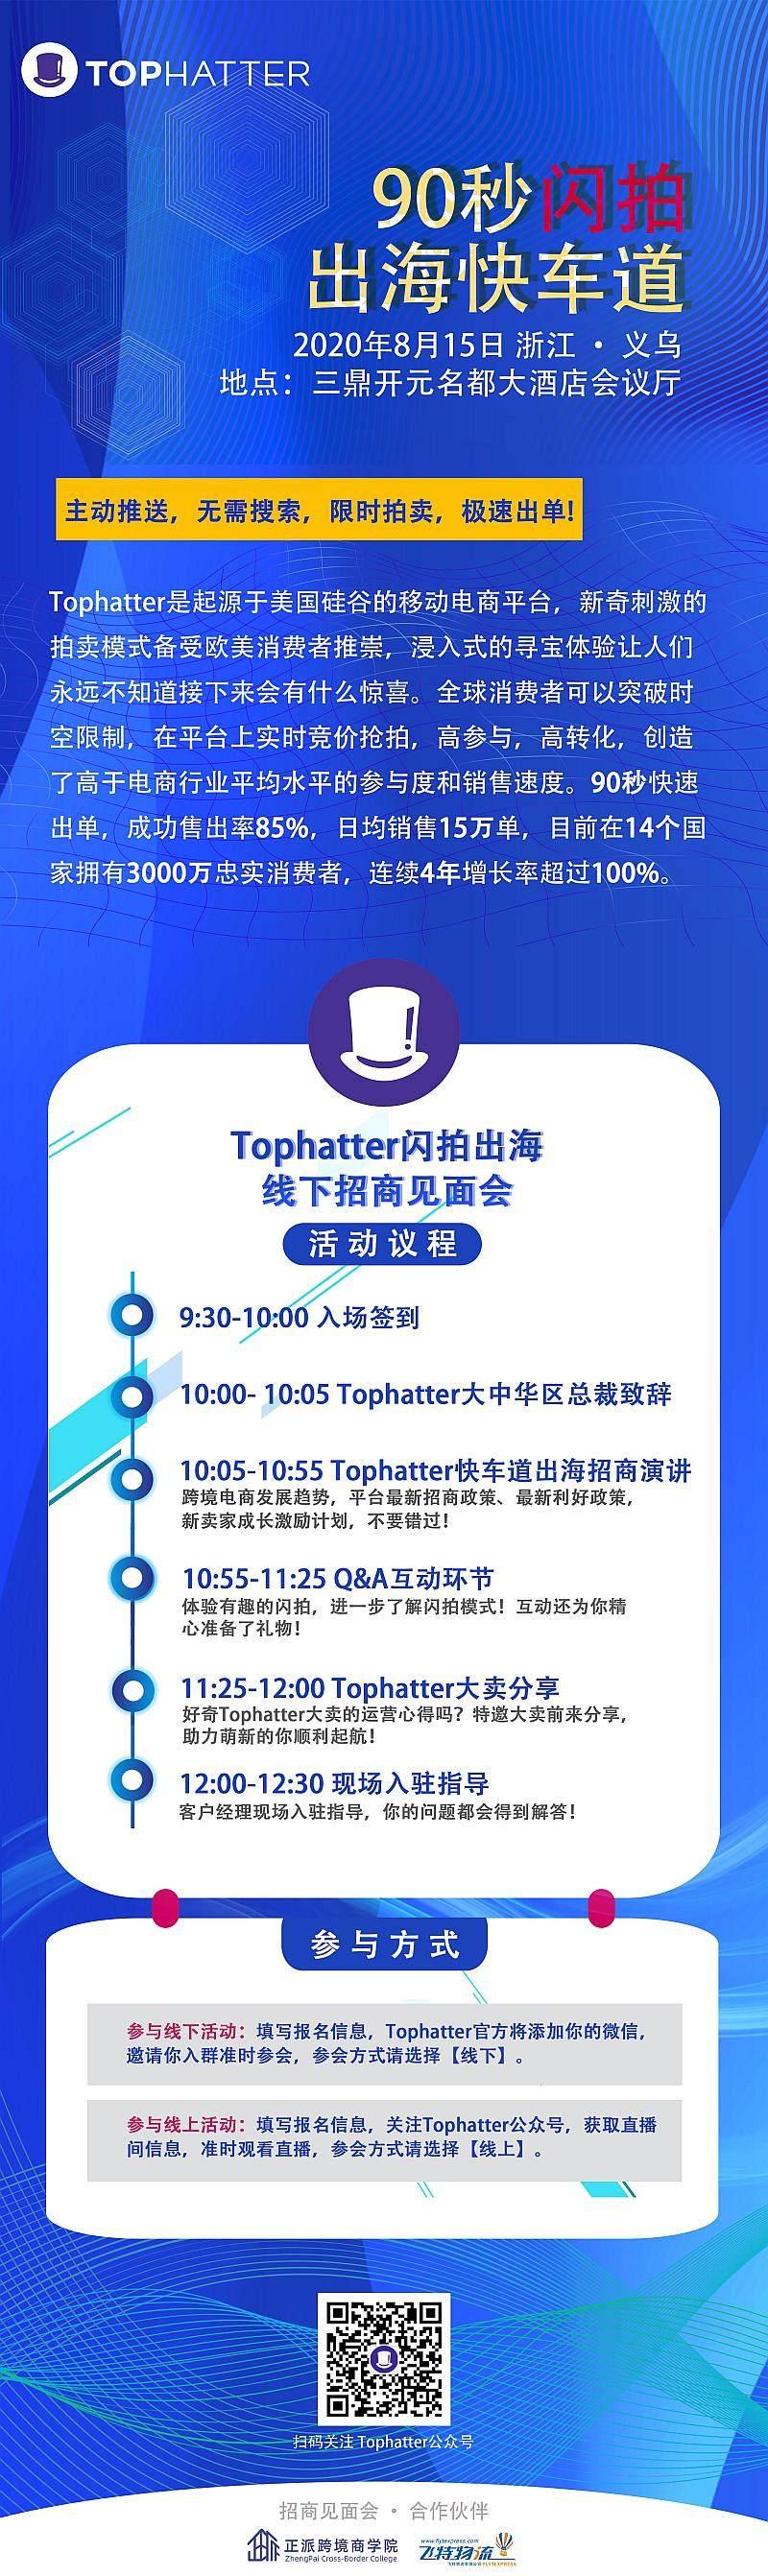 Tophatter闪拍义乌线下招商见面会(8月15日)